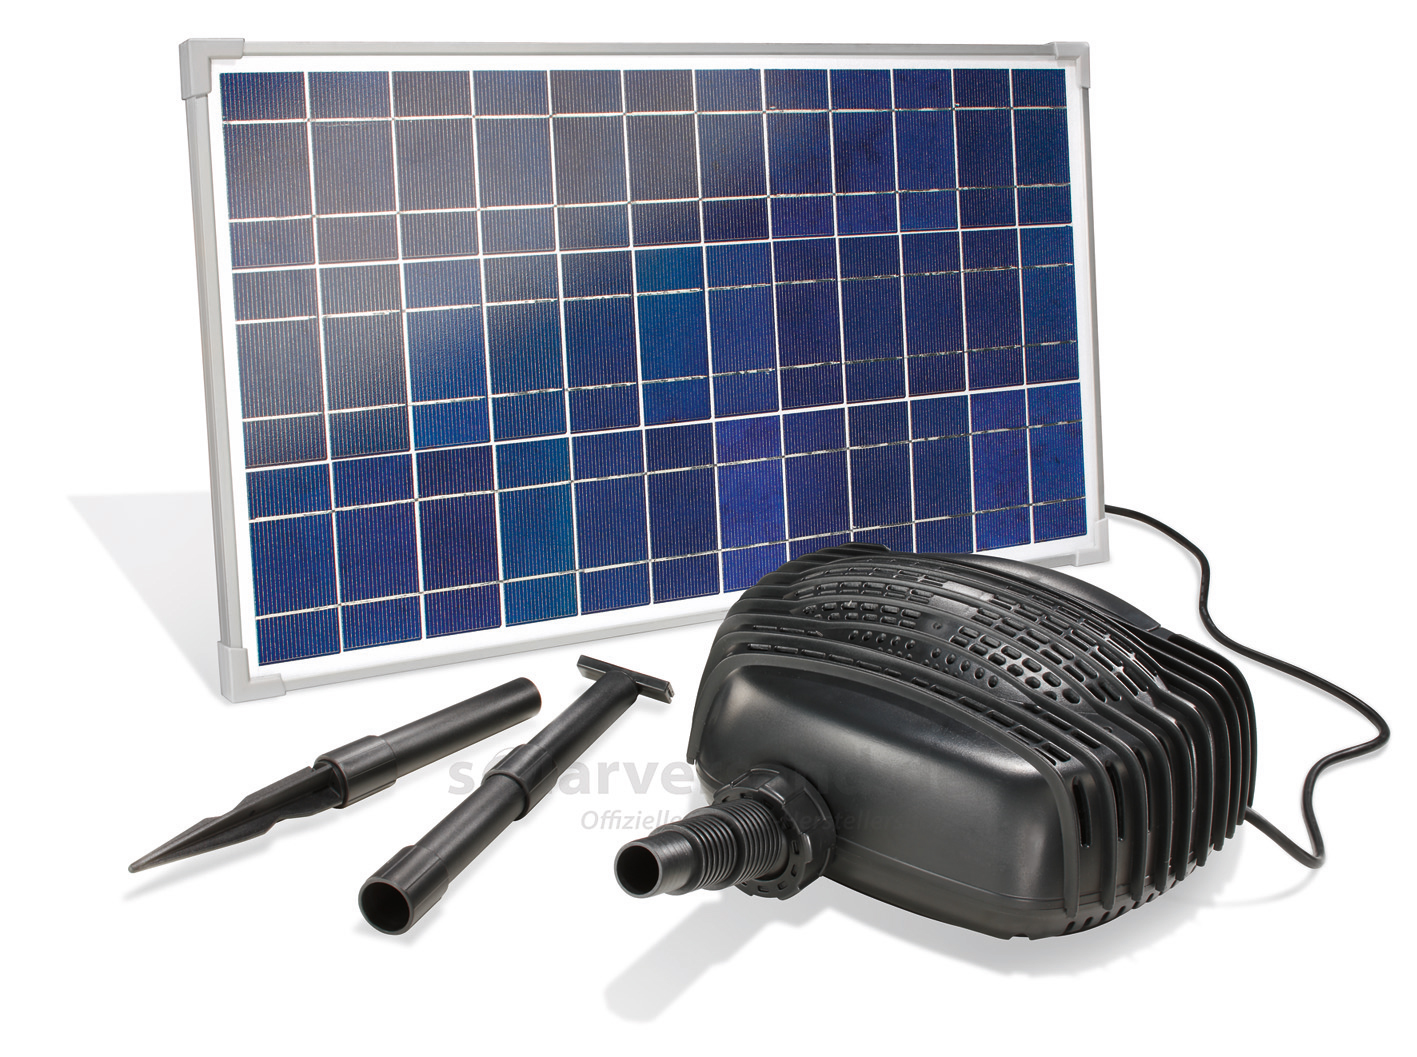 solar bachlaufsystem garda. Black Bedroom Furniture Sets. Home Design Ideas